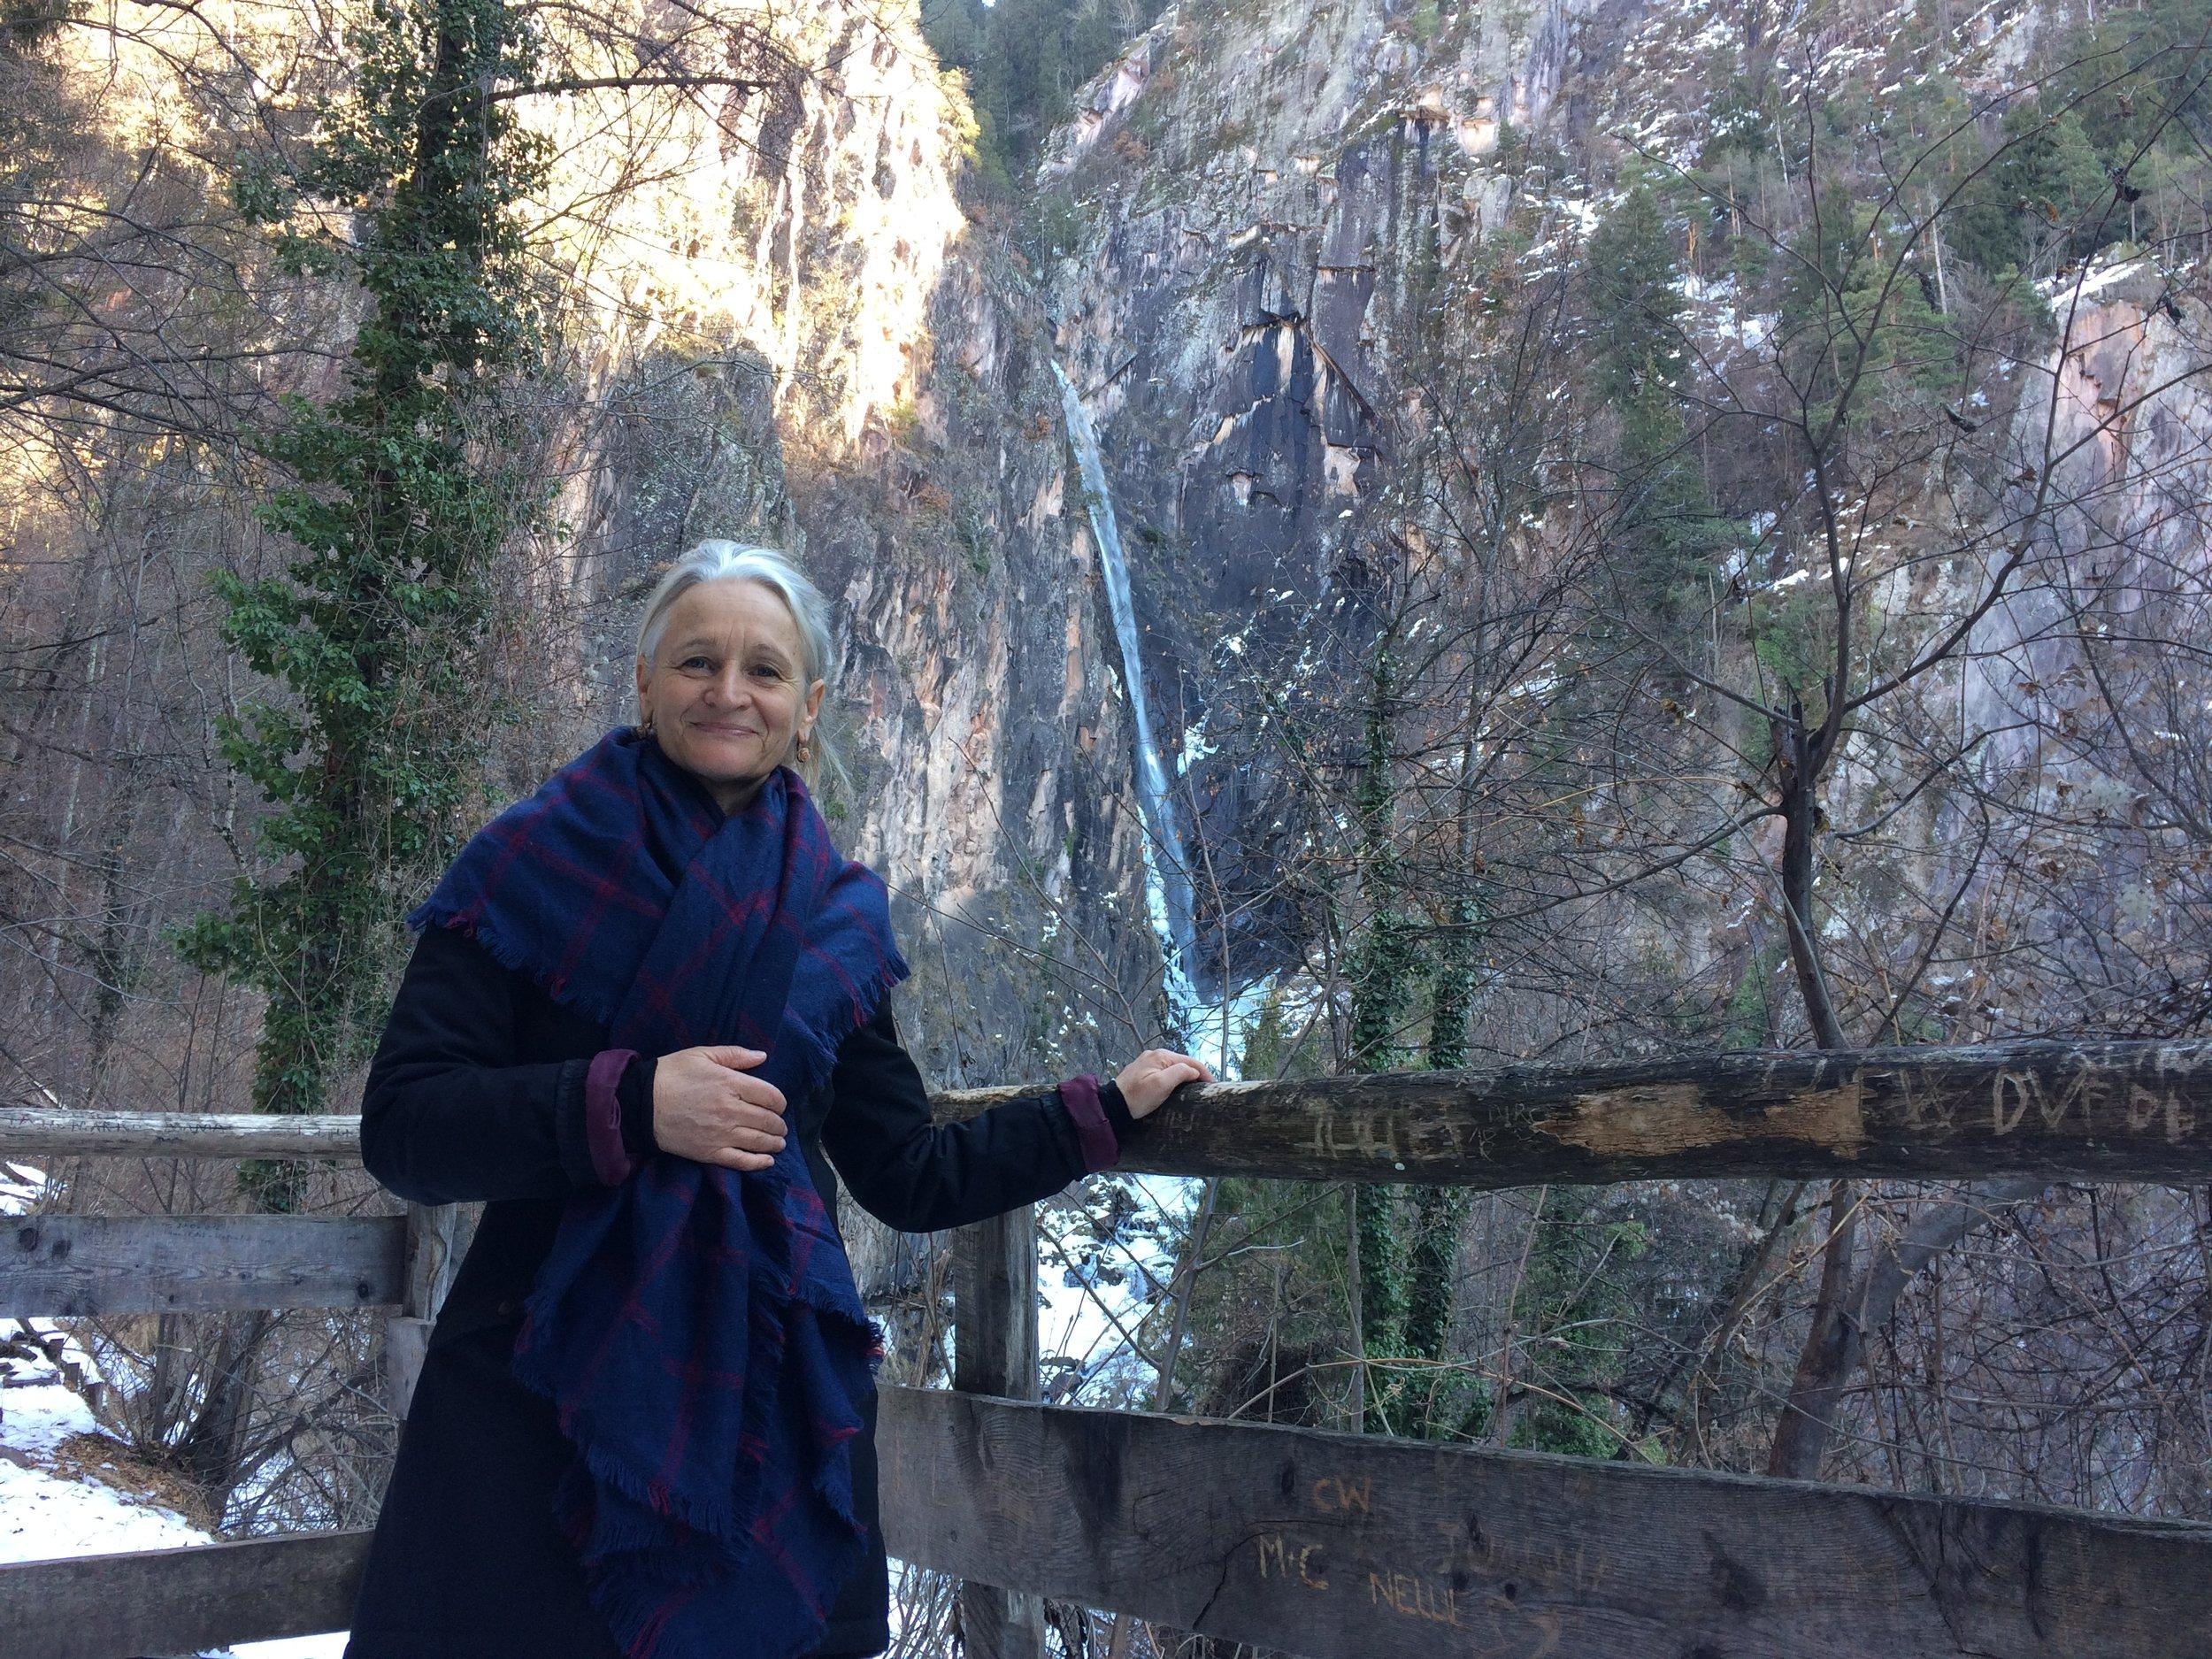 Monika basking in the Pristine Natural Wilderness near Merano, Italy